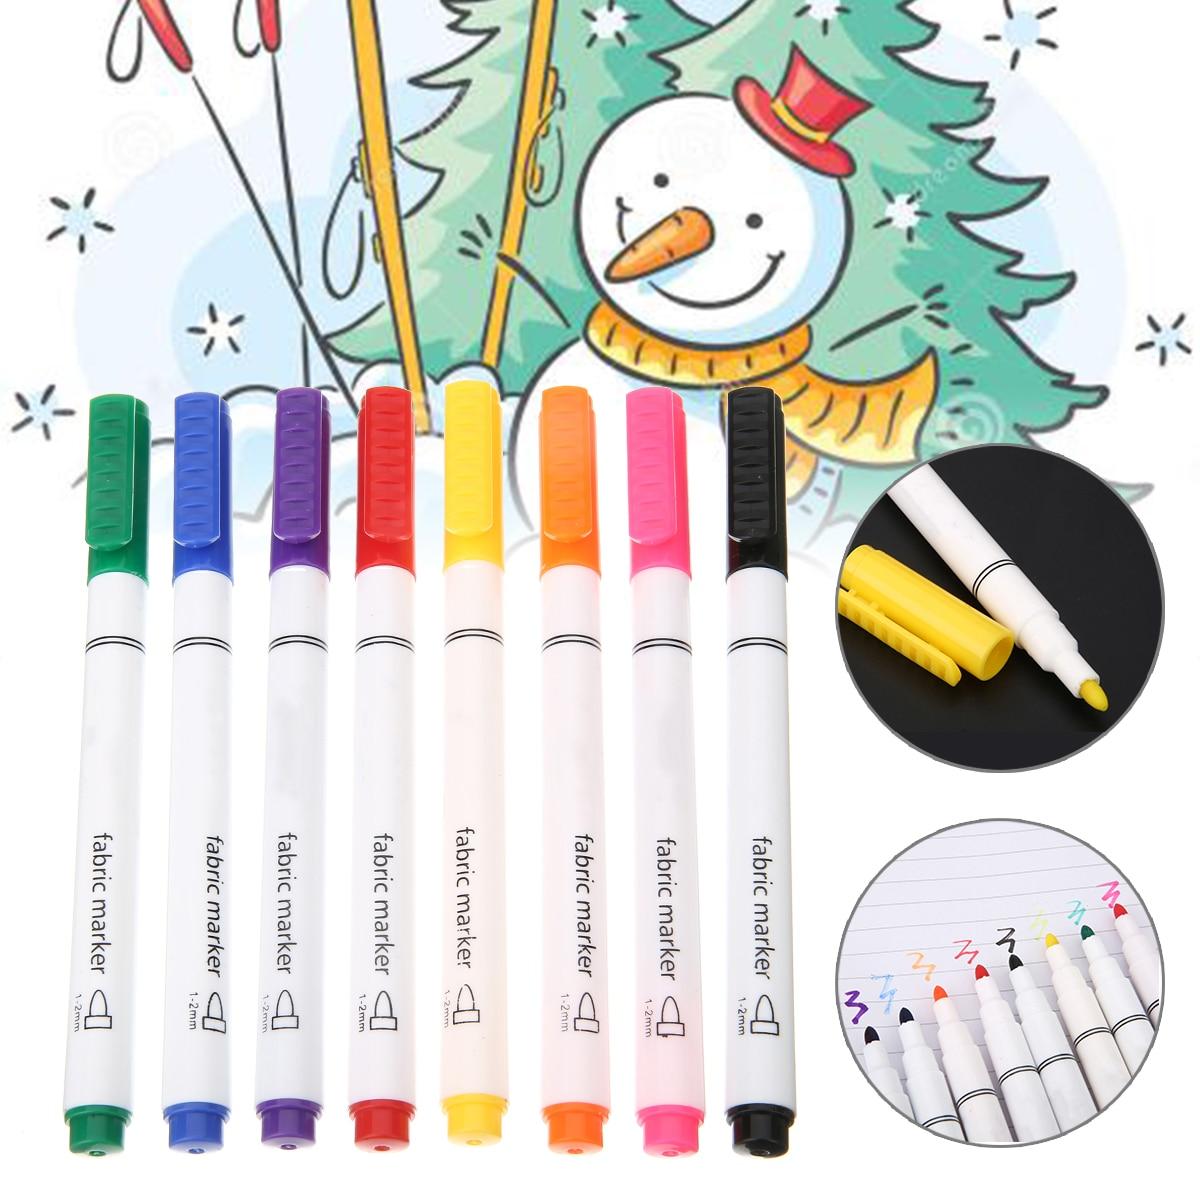 8 Colors Permanent Art Marker Fabric Pens For T-shirt Liner Textile Ink Cloth Paint Color DIY Design For Artist Painting Pen